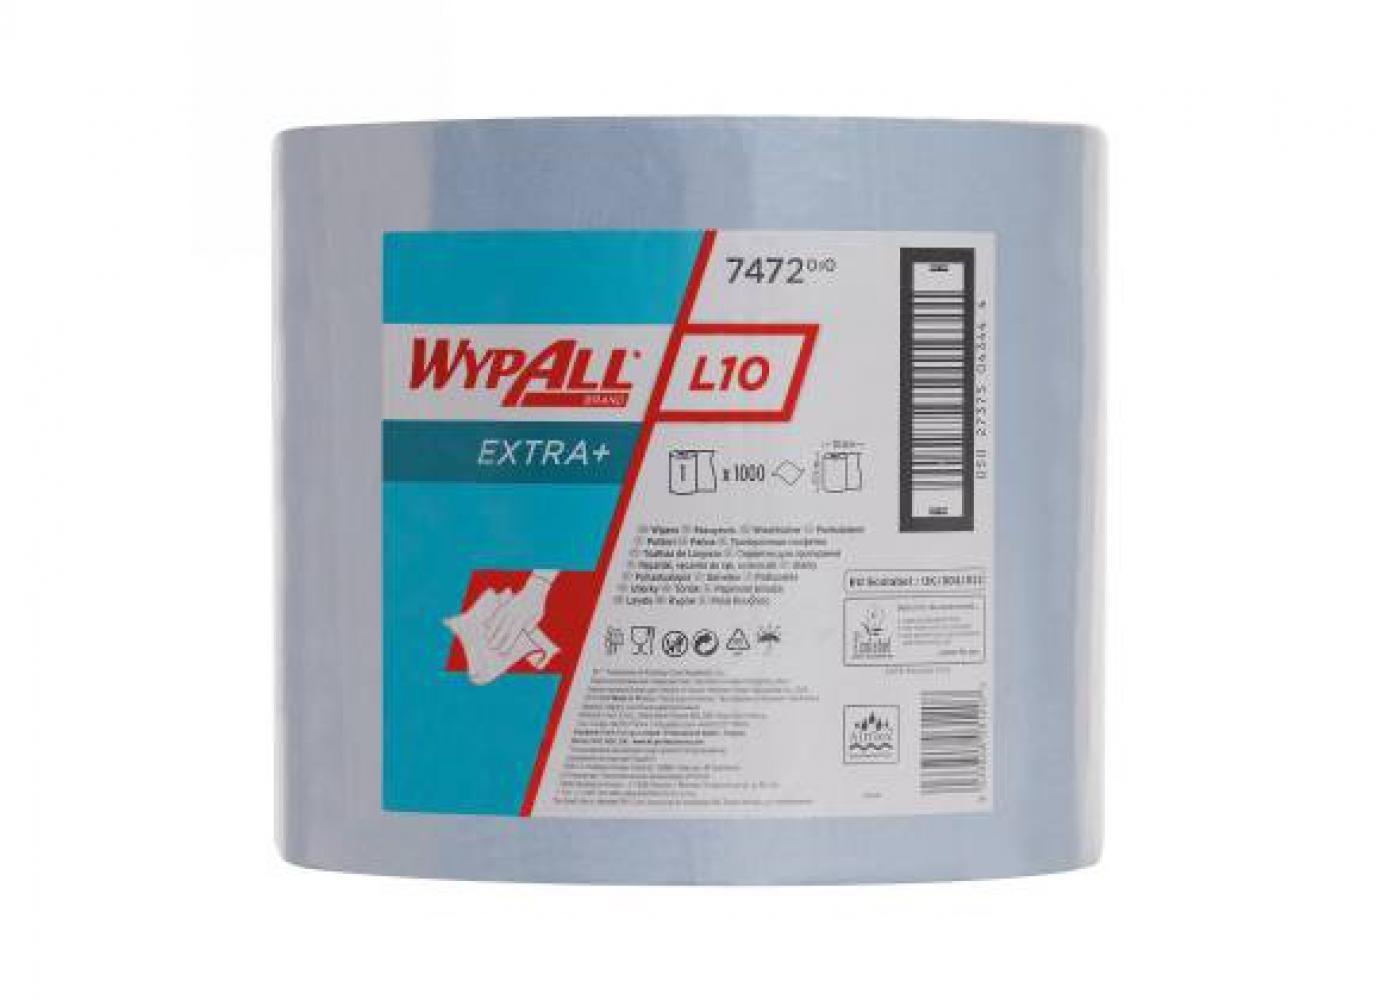 Acquista Wypall L10 Extra Bobina Blu Airflex 17545613 | Glooke.com